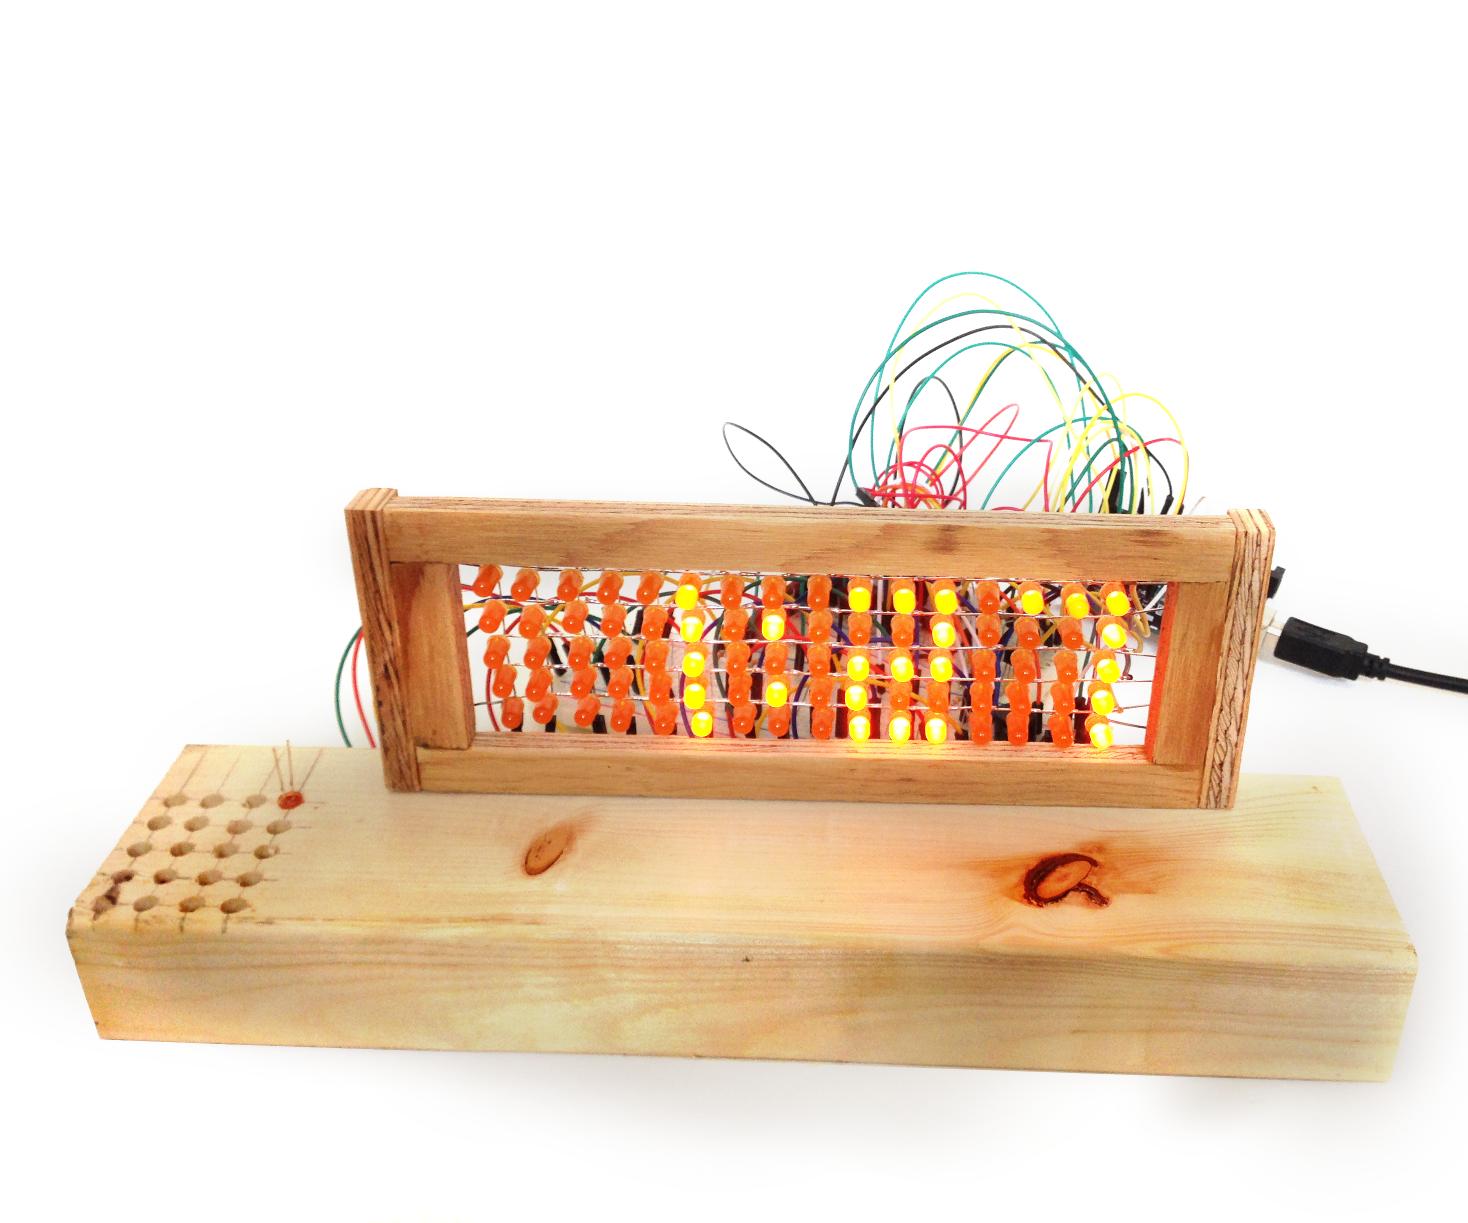 How to make a LED Matrix(that I use as a Clock)